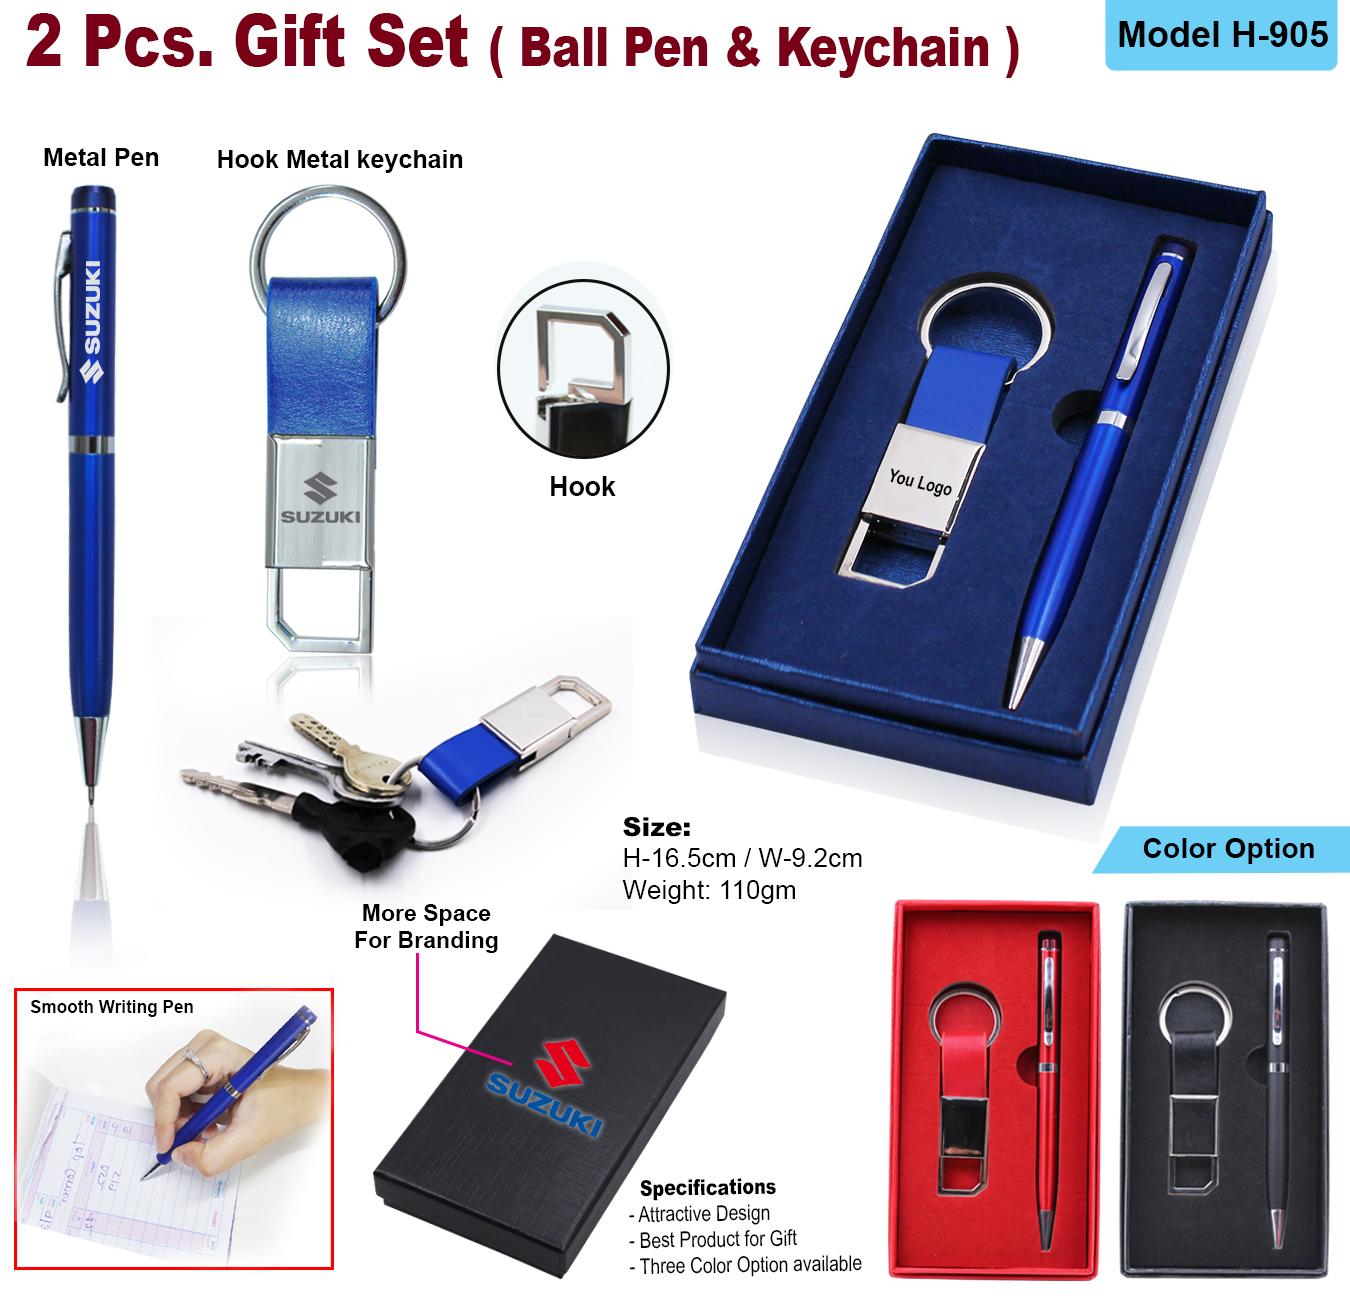 2pcs Gift Set Ball Pen & Keychain H-905